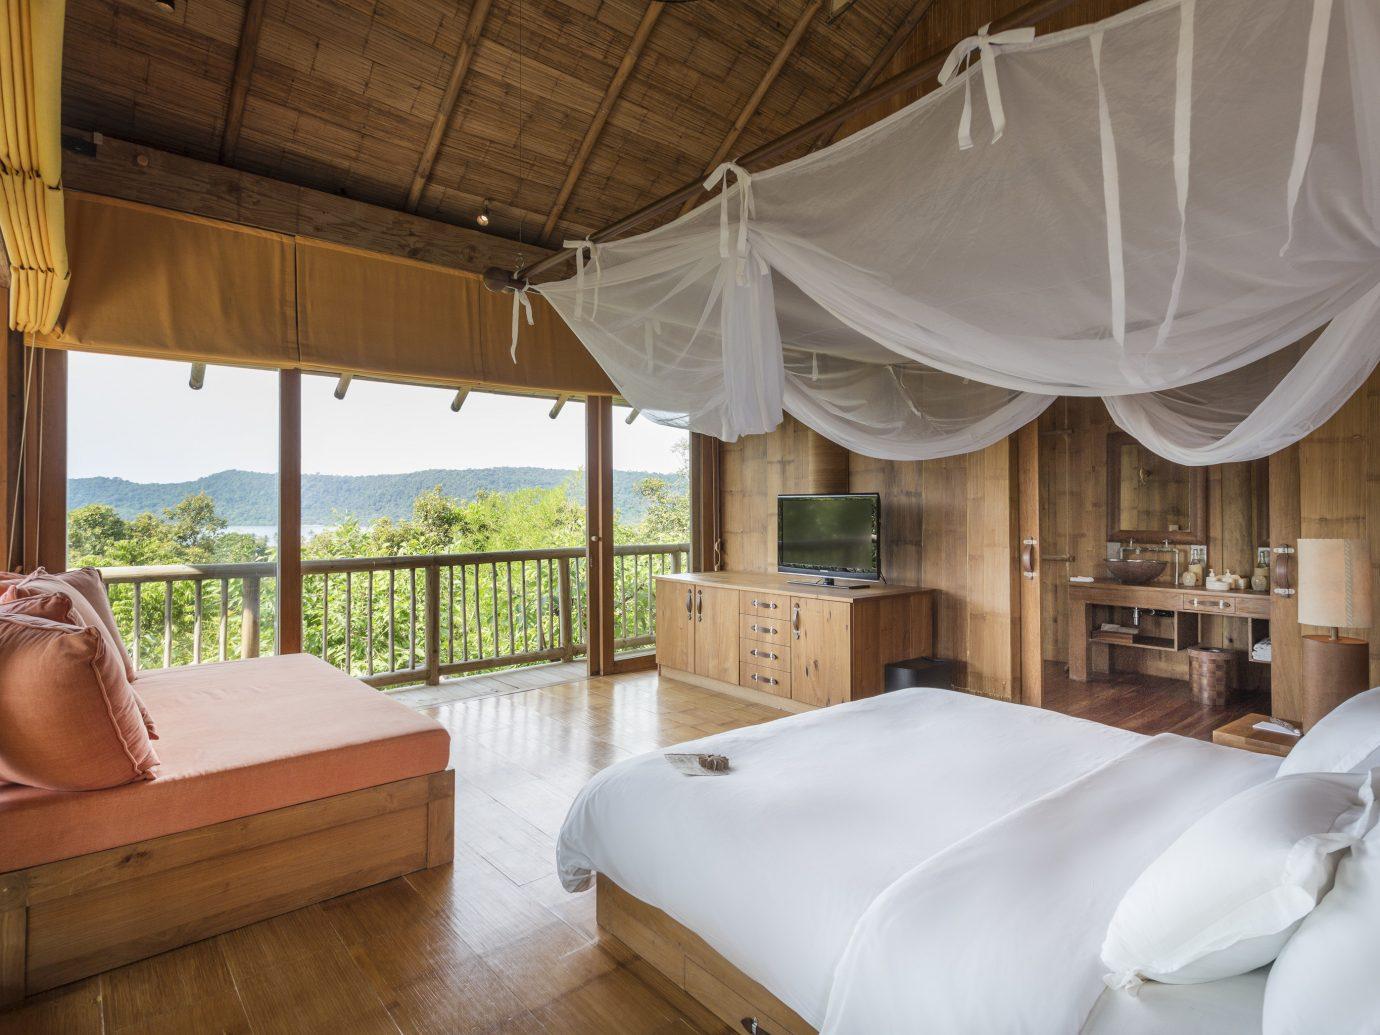 Health + Wellness Hotels Yoga Retreats indoor floor room property Resort estate interior design Bedroom cottage bed Villa Suite real estate furniture several